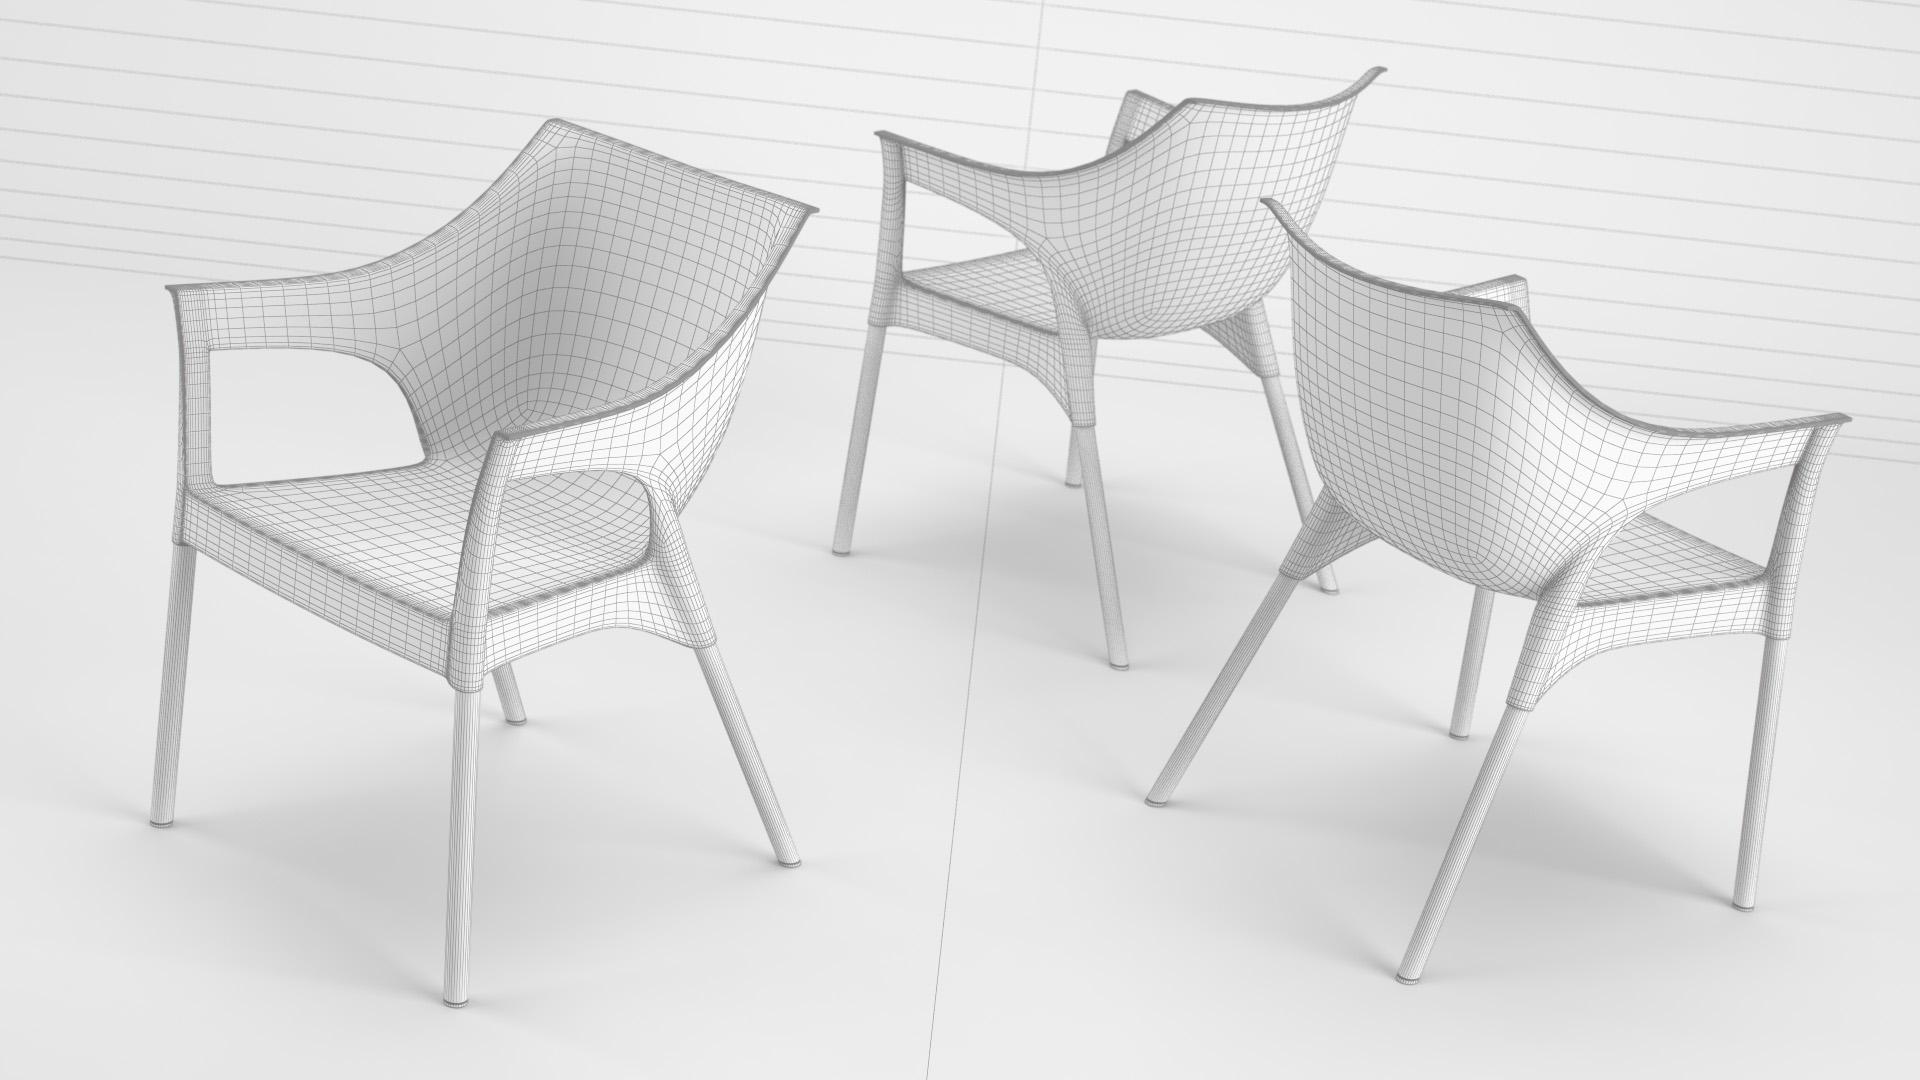 Pole_Chair_WhiteSet_01_wire_0003